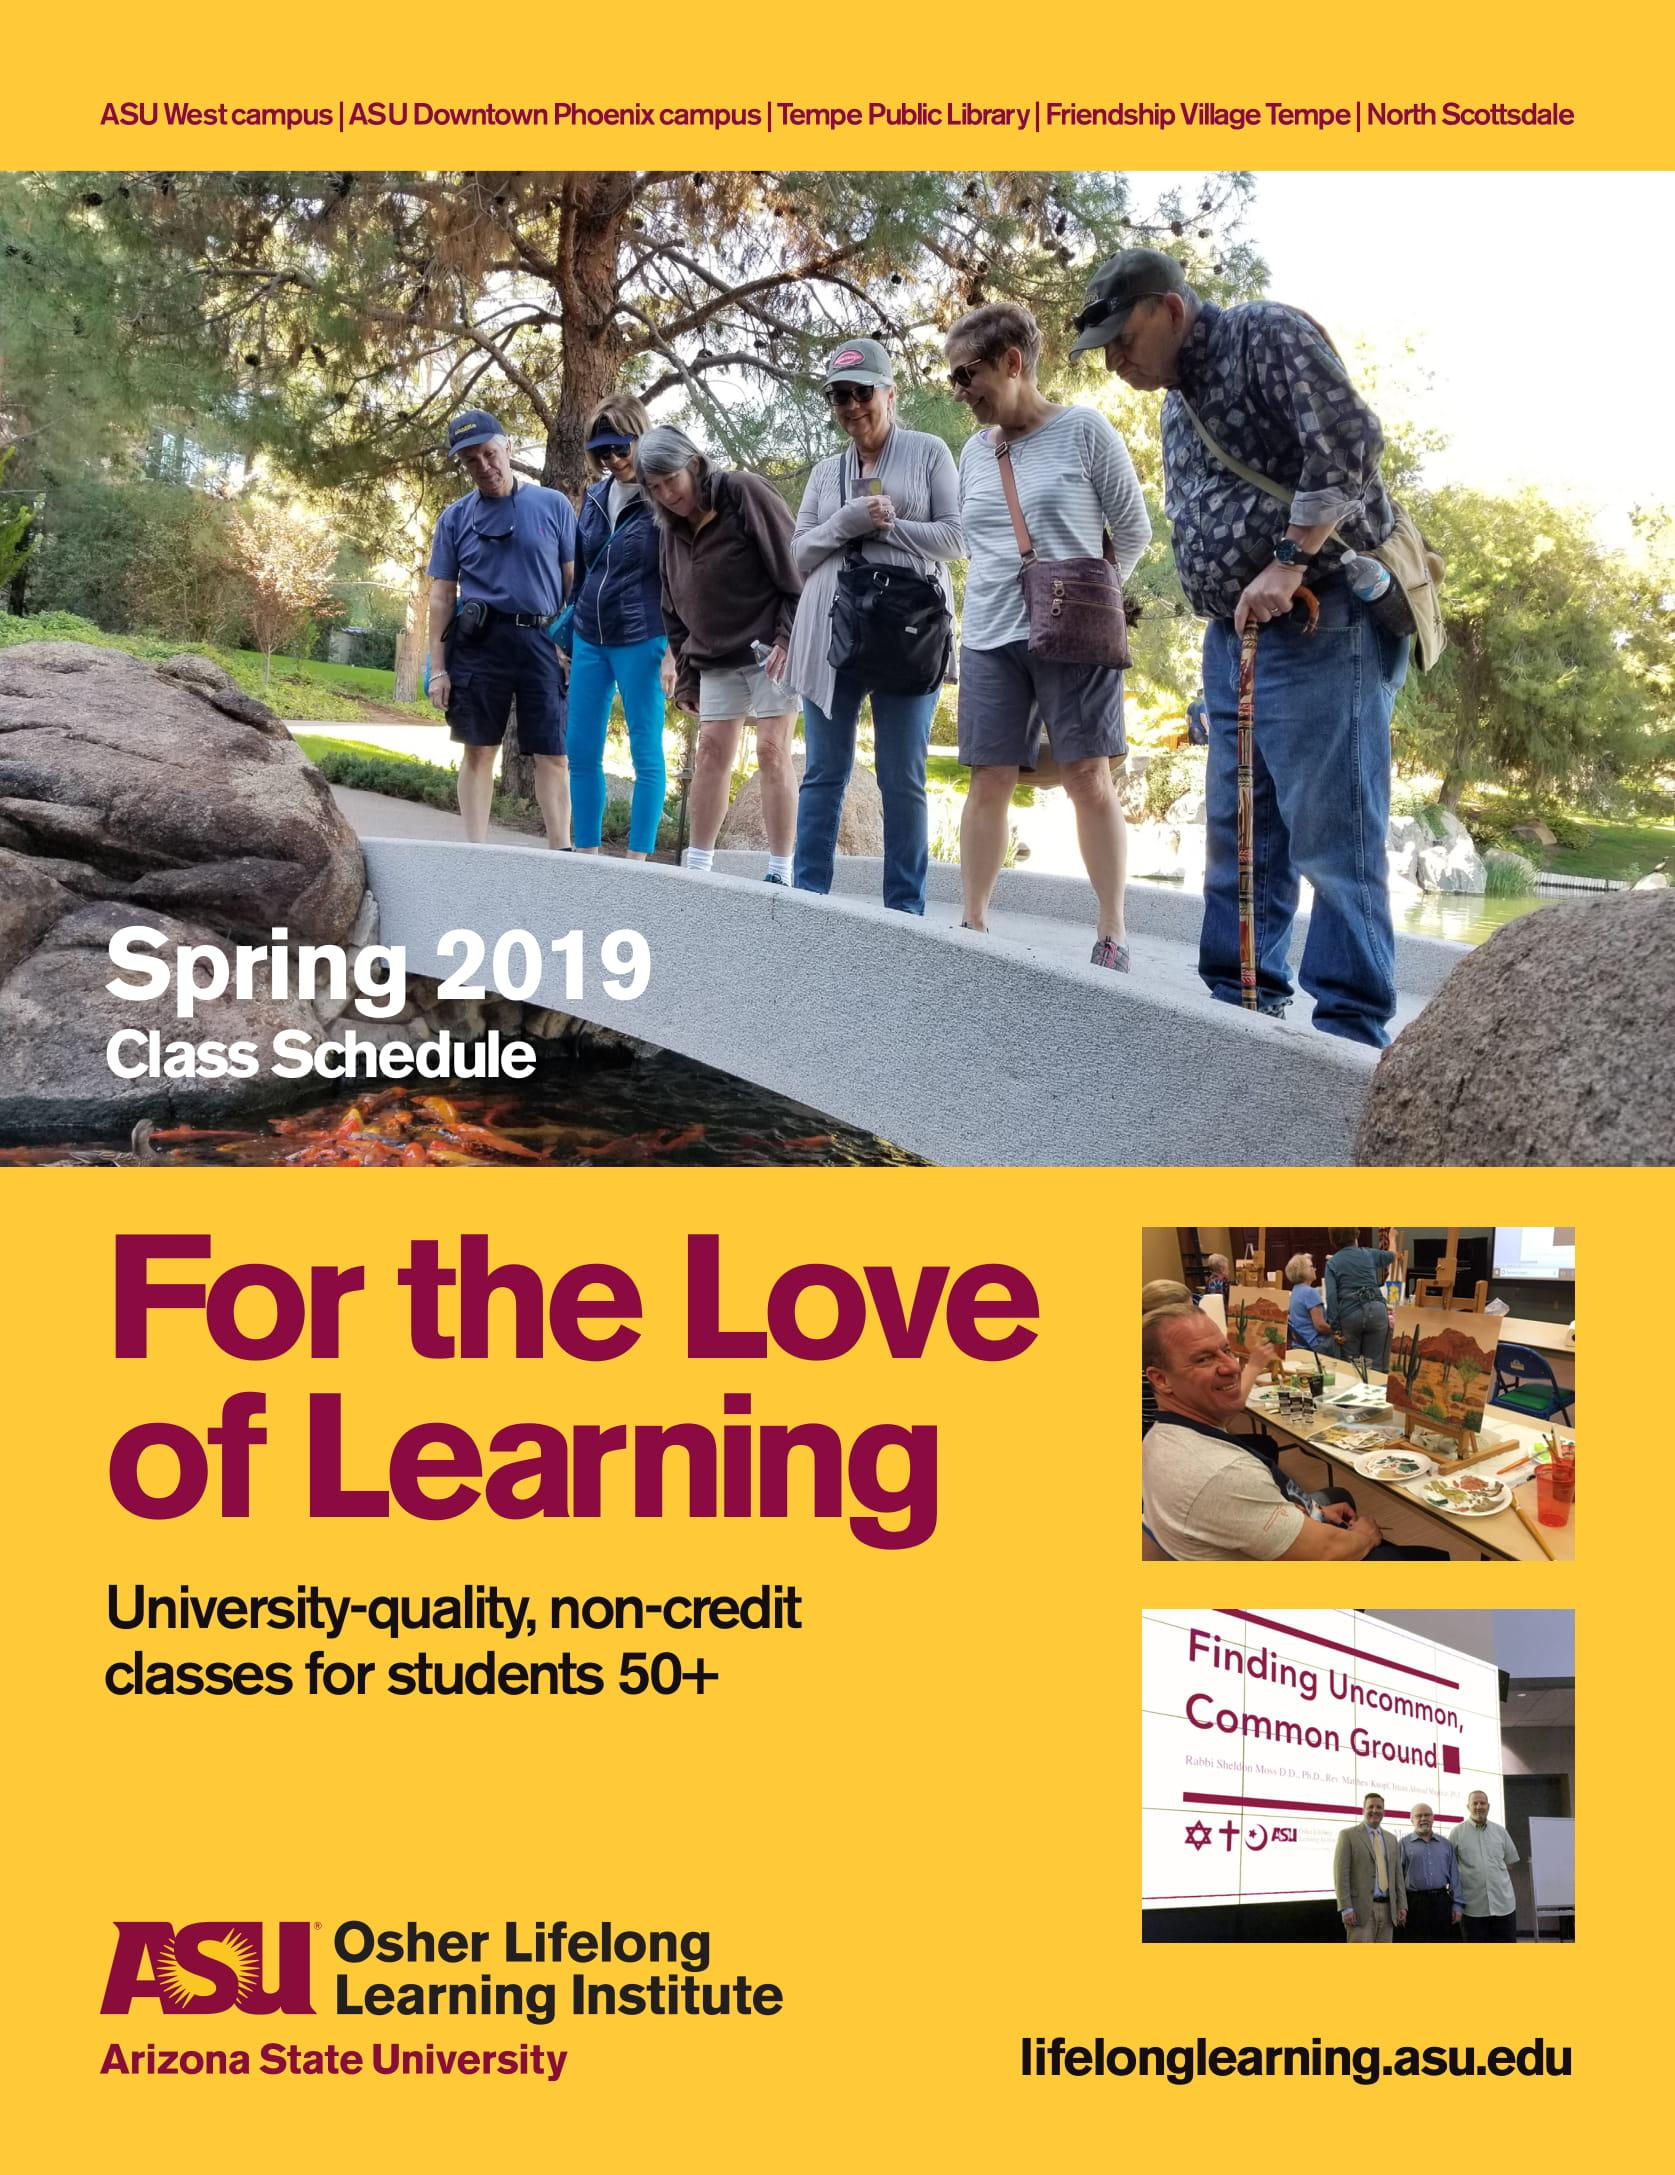 Spring 2019 Class Schedule